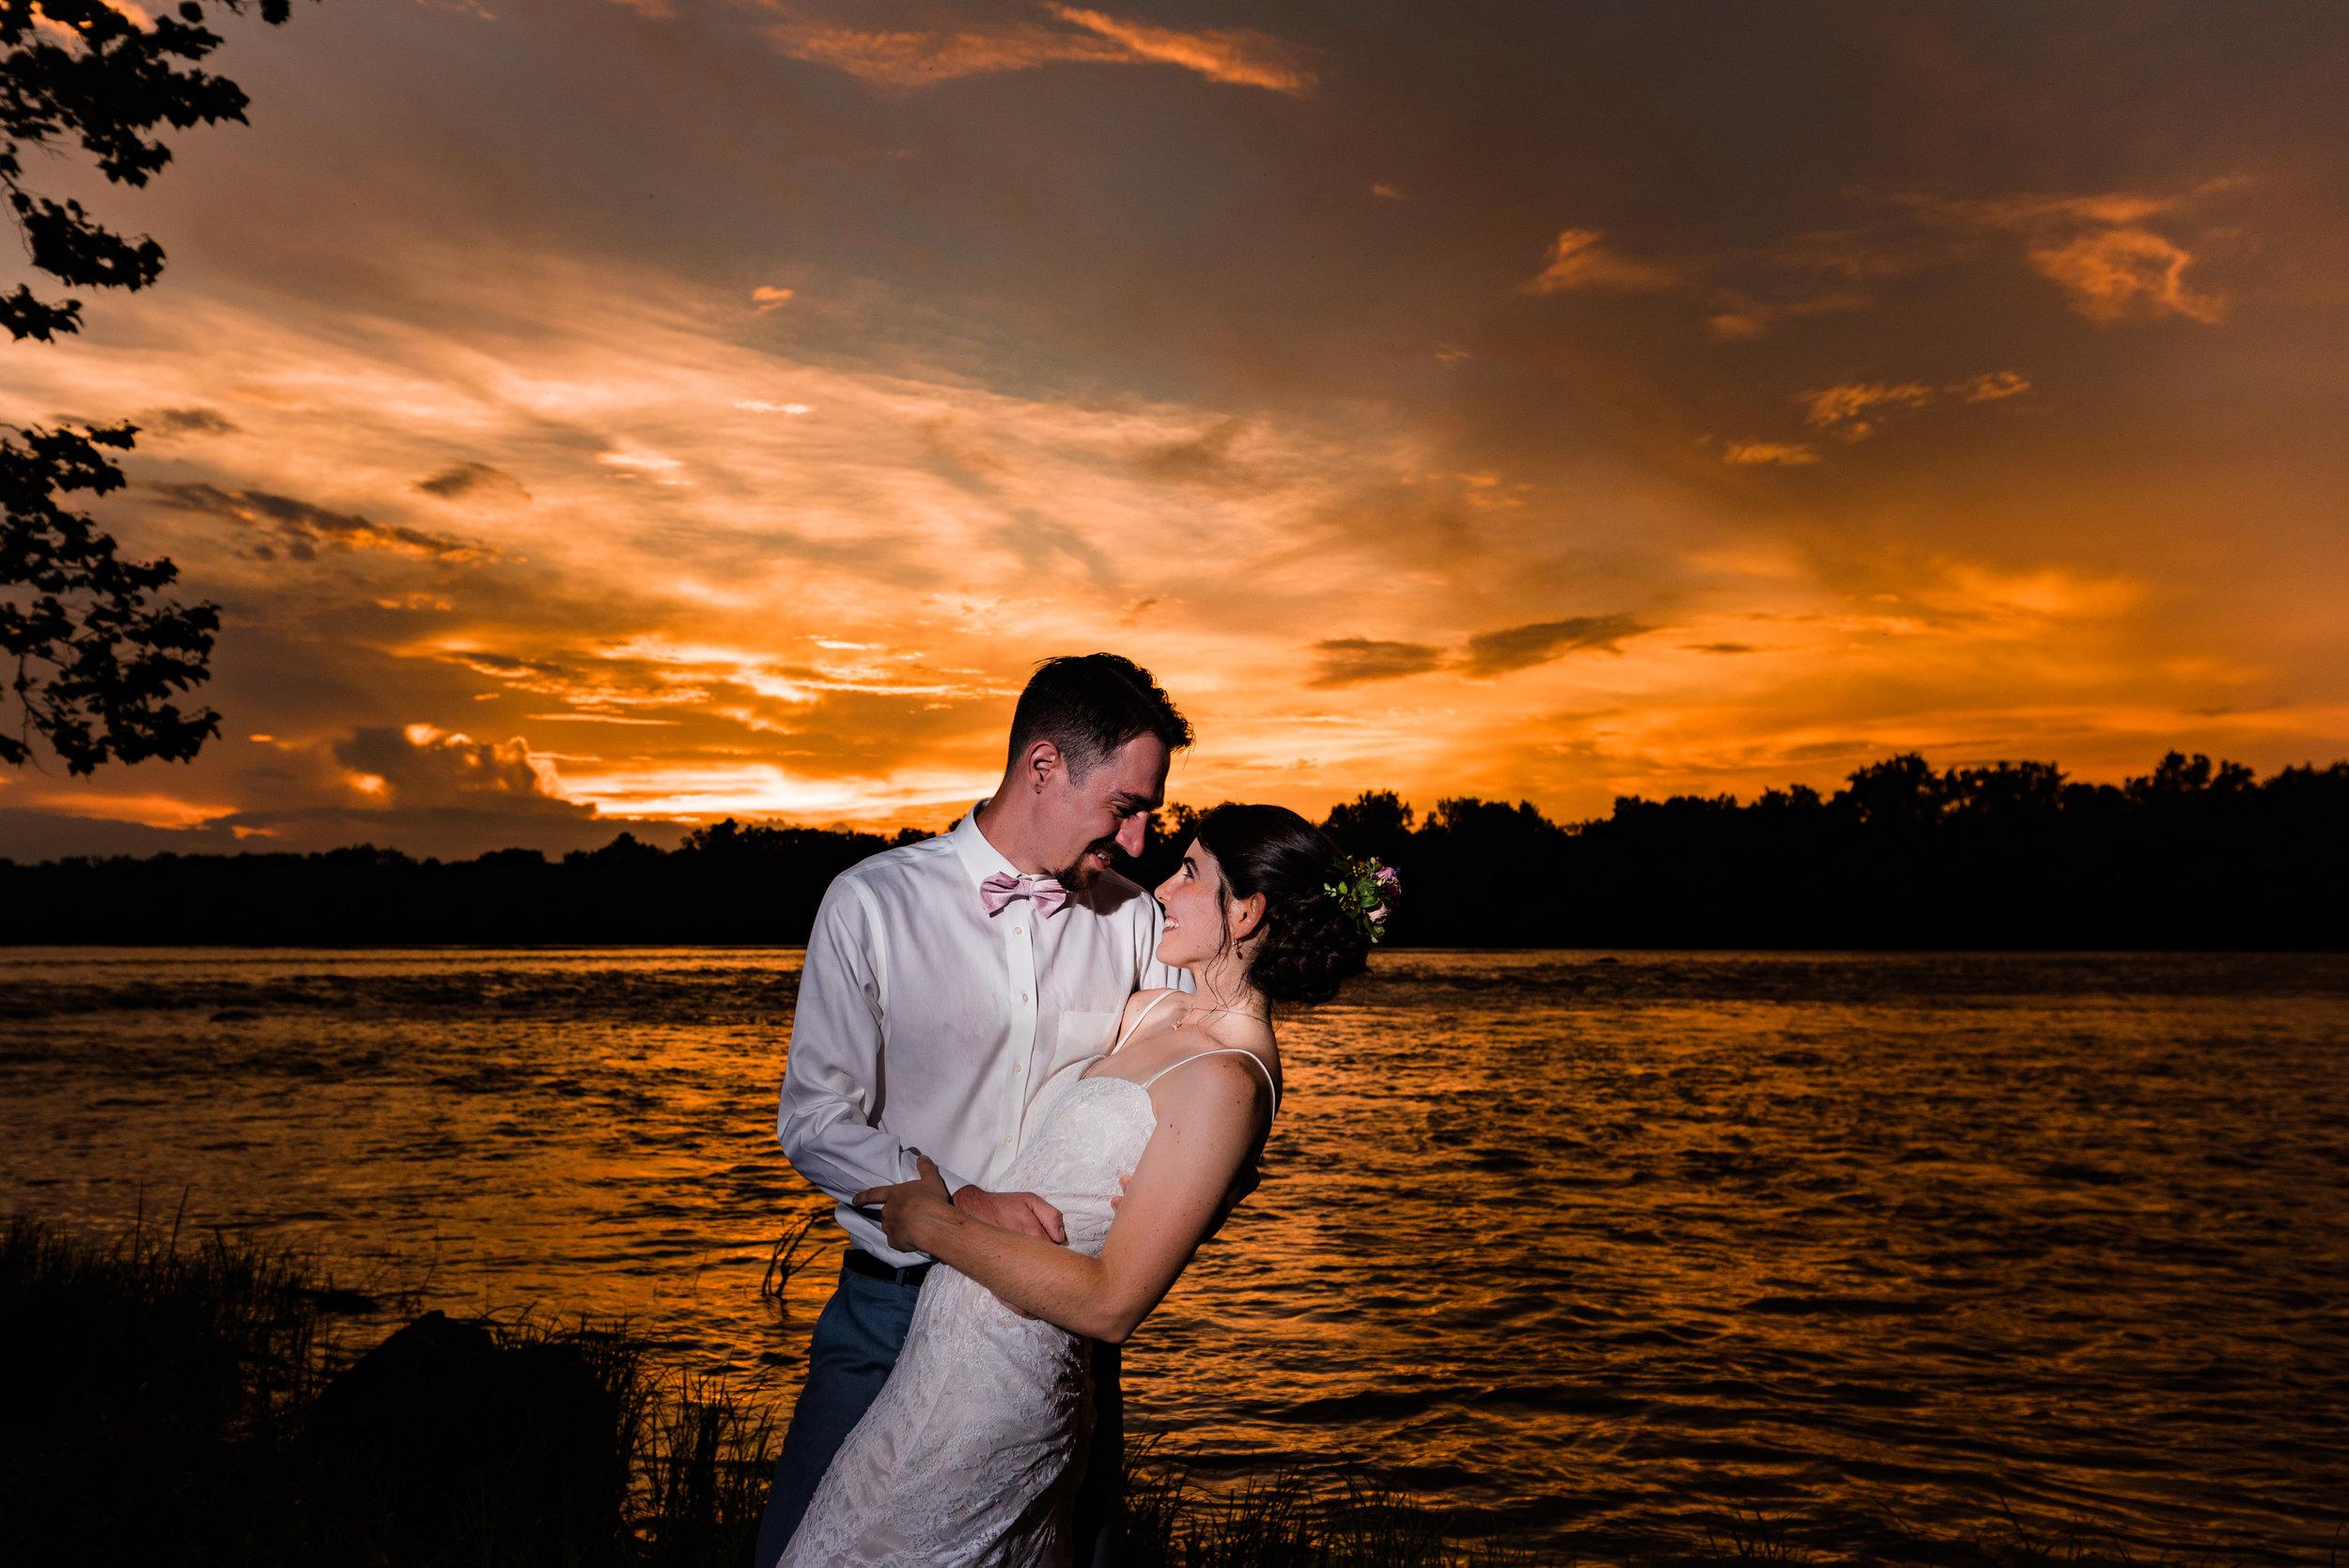 wedding photography in toledo ohio